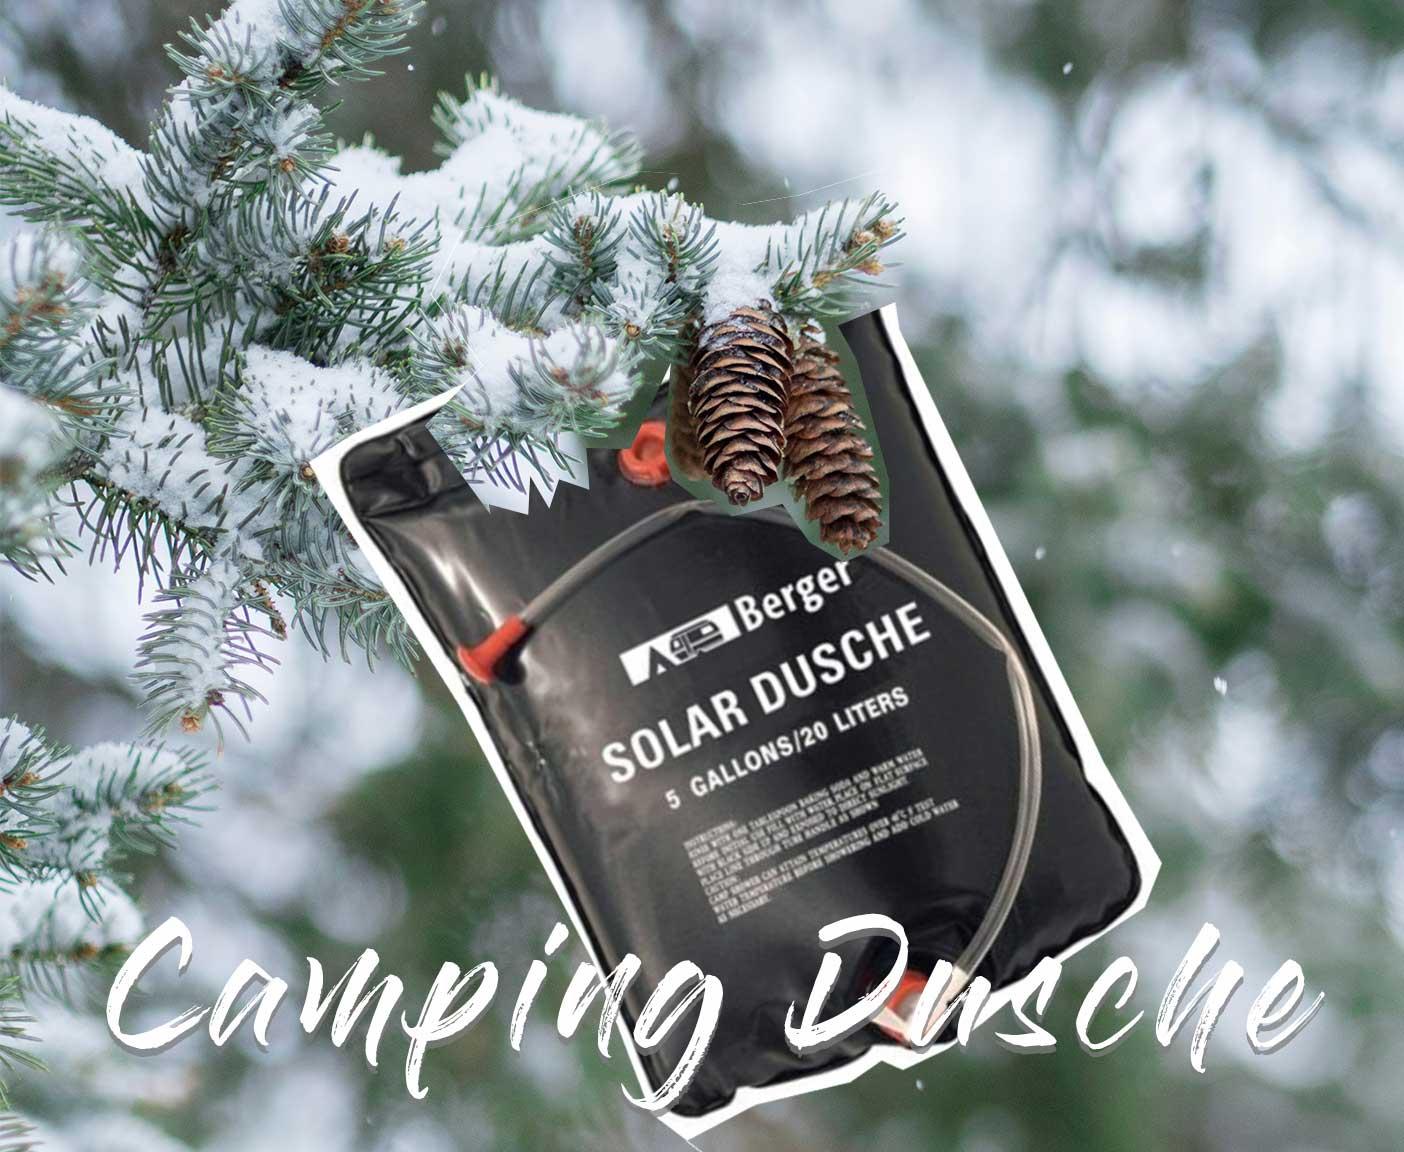 camper-geschenk-weihnachten-geschenkideen-wohnmobil-lustige-accessoires-geschenkkorb-camping-ideen-campen-geburtstag-camp-geschichten-vanlife-1-CampingDusche_1